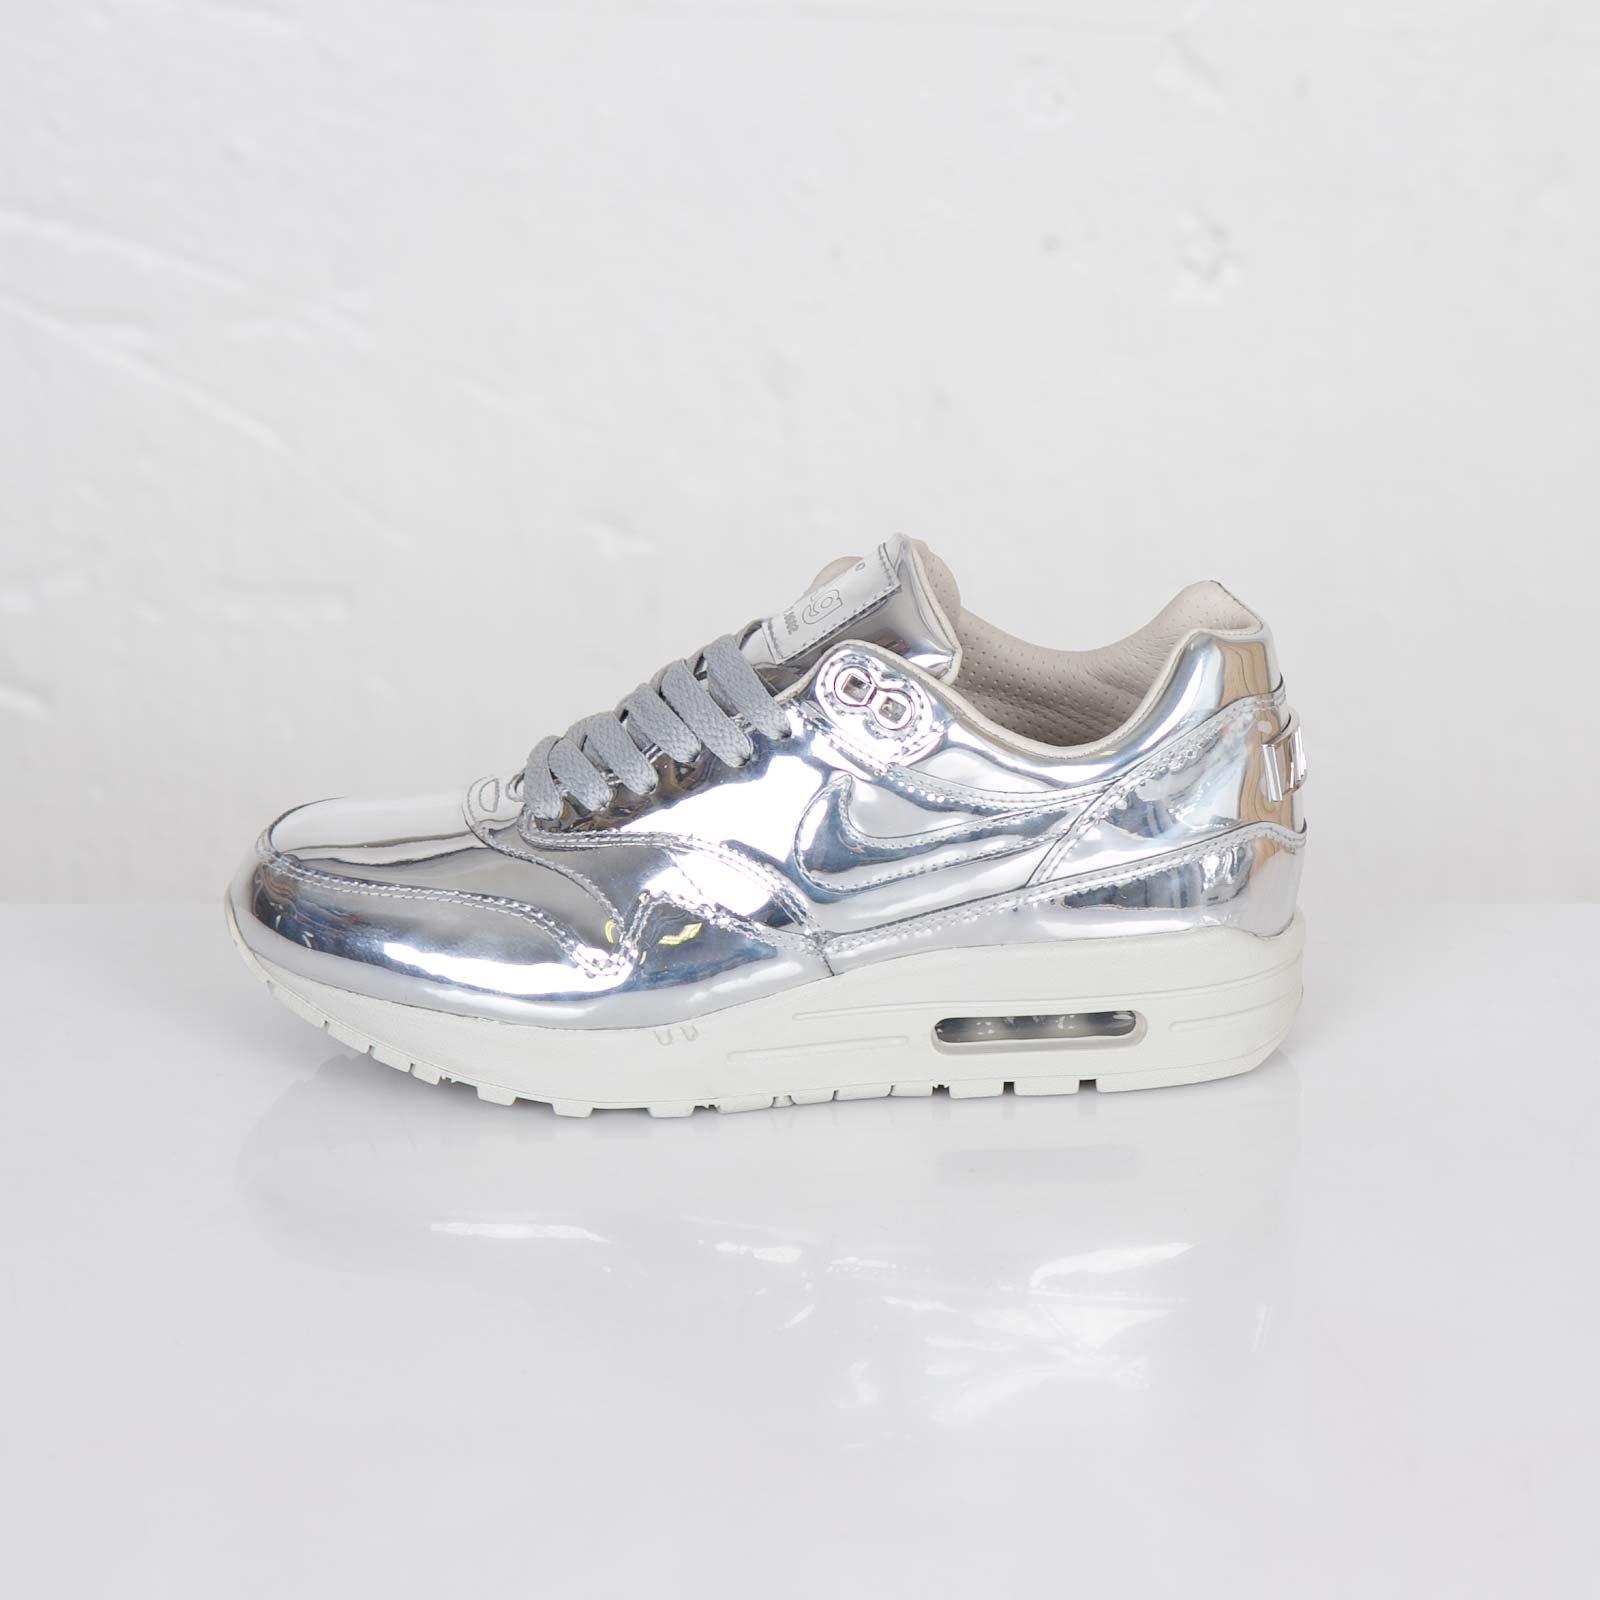 Details about Nike WMNS Air Max 1 SP Liquid Metal Metallic Silver 616170 090